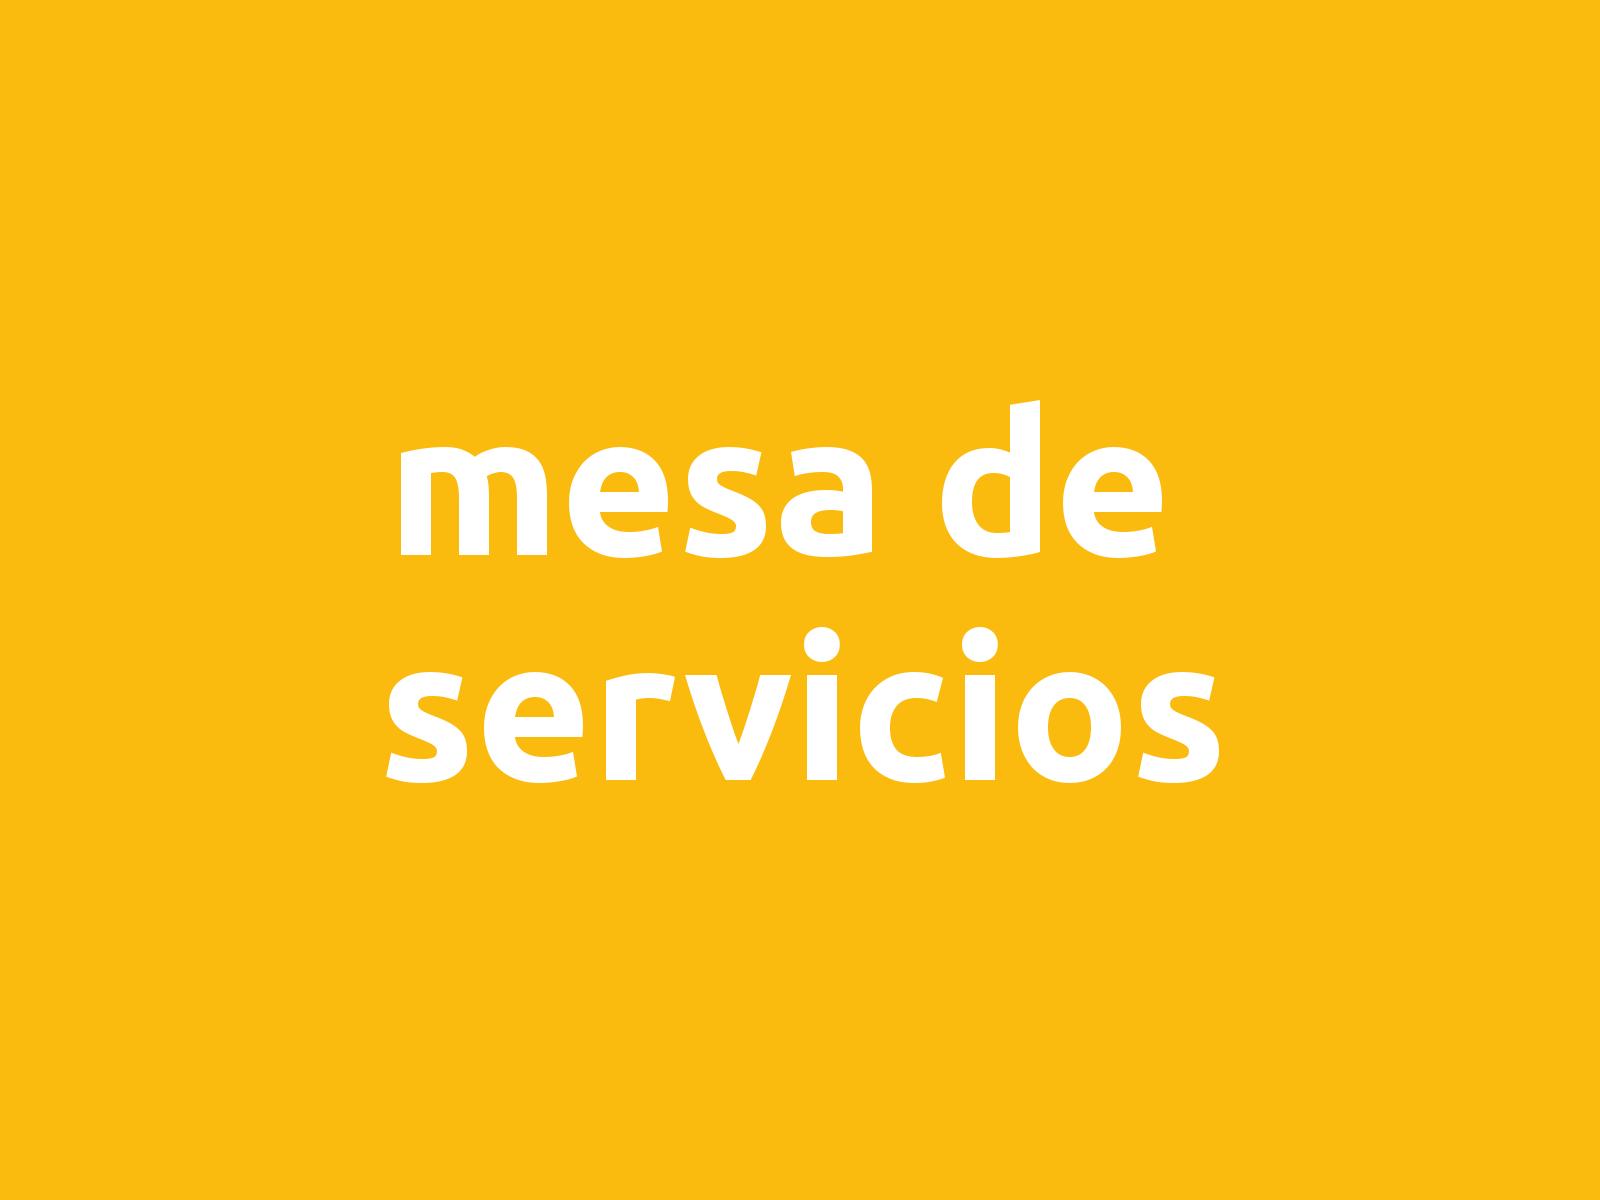 ServiceDesk, PQRS